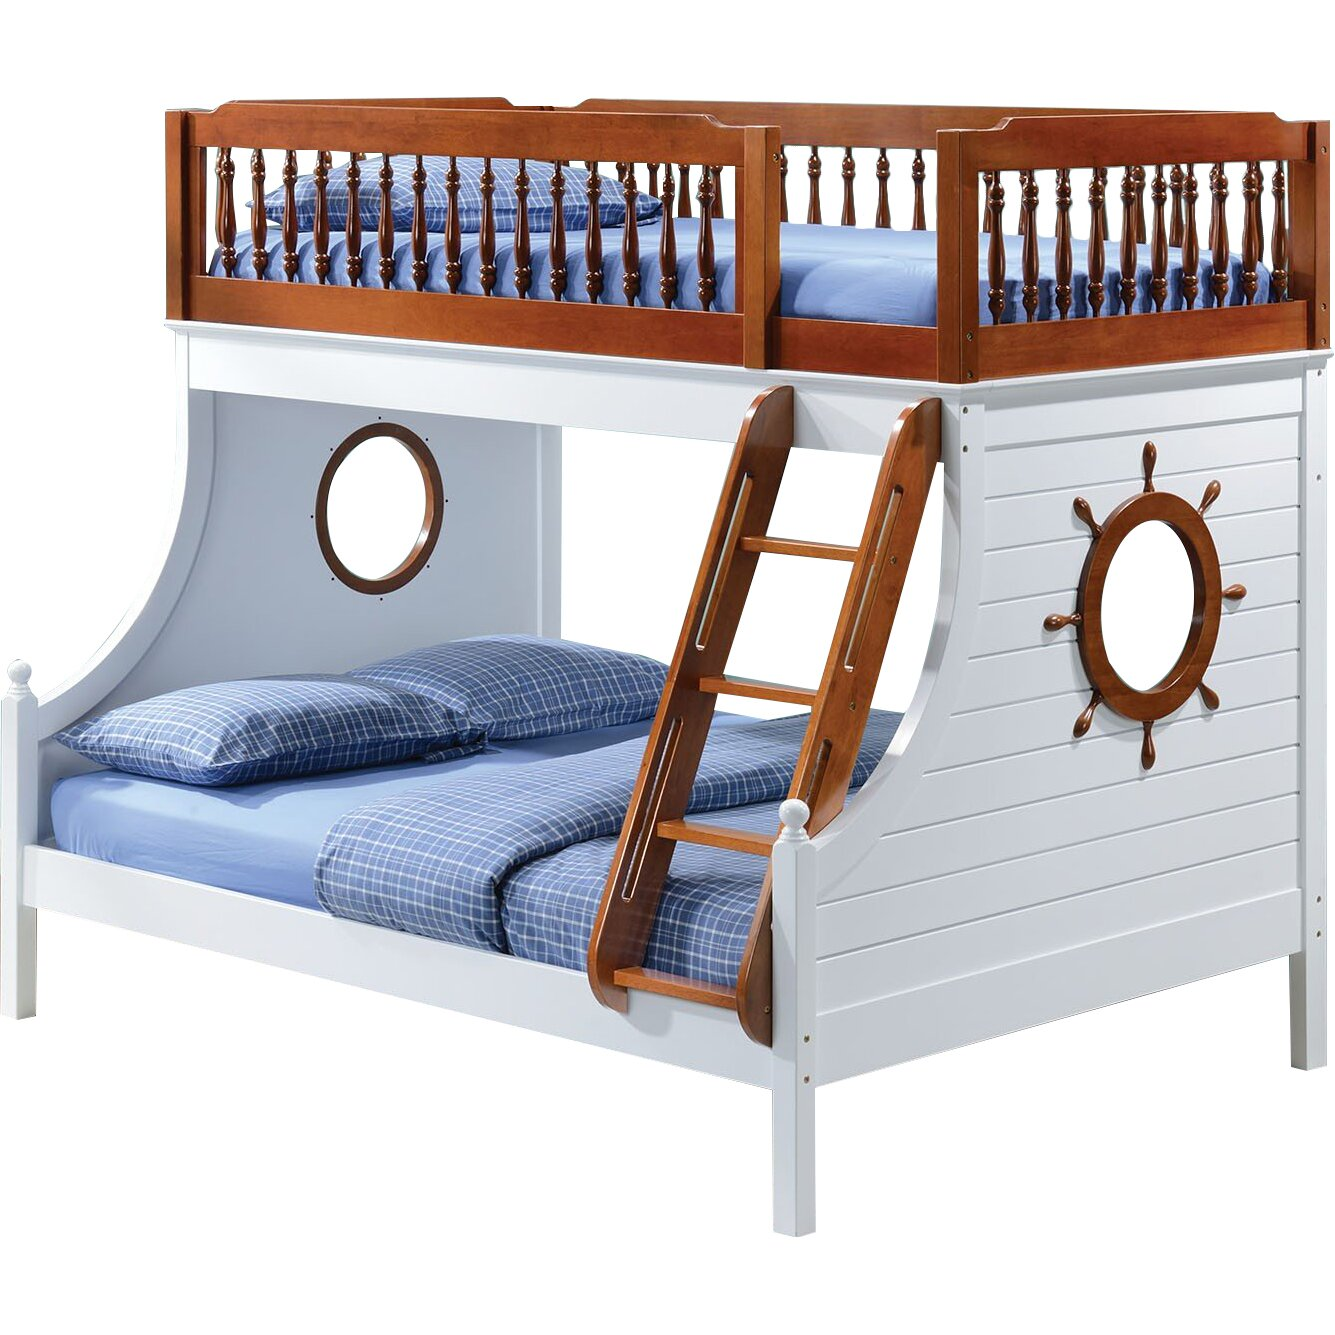 Infini Furnishings Captain Twin Over Full Bunk Bed